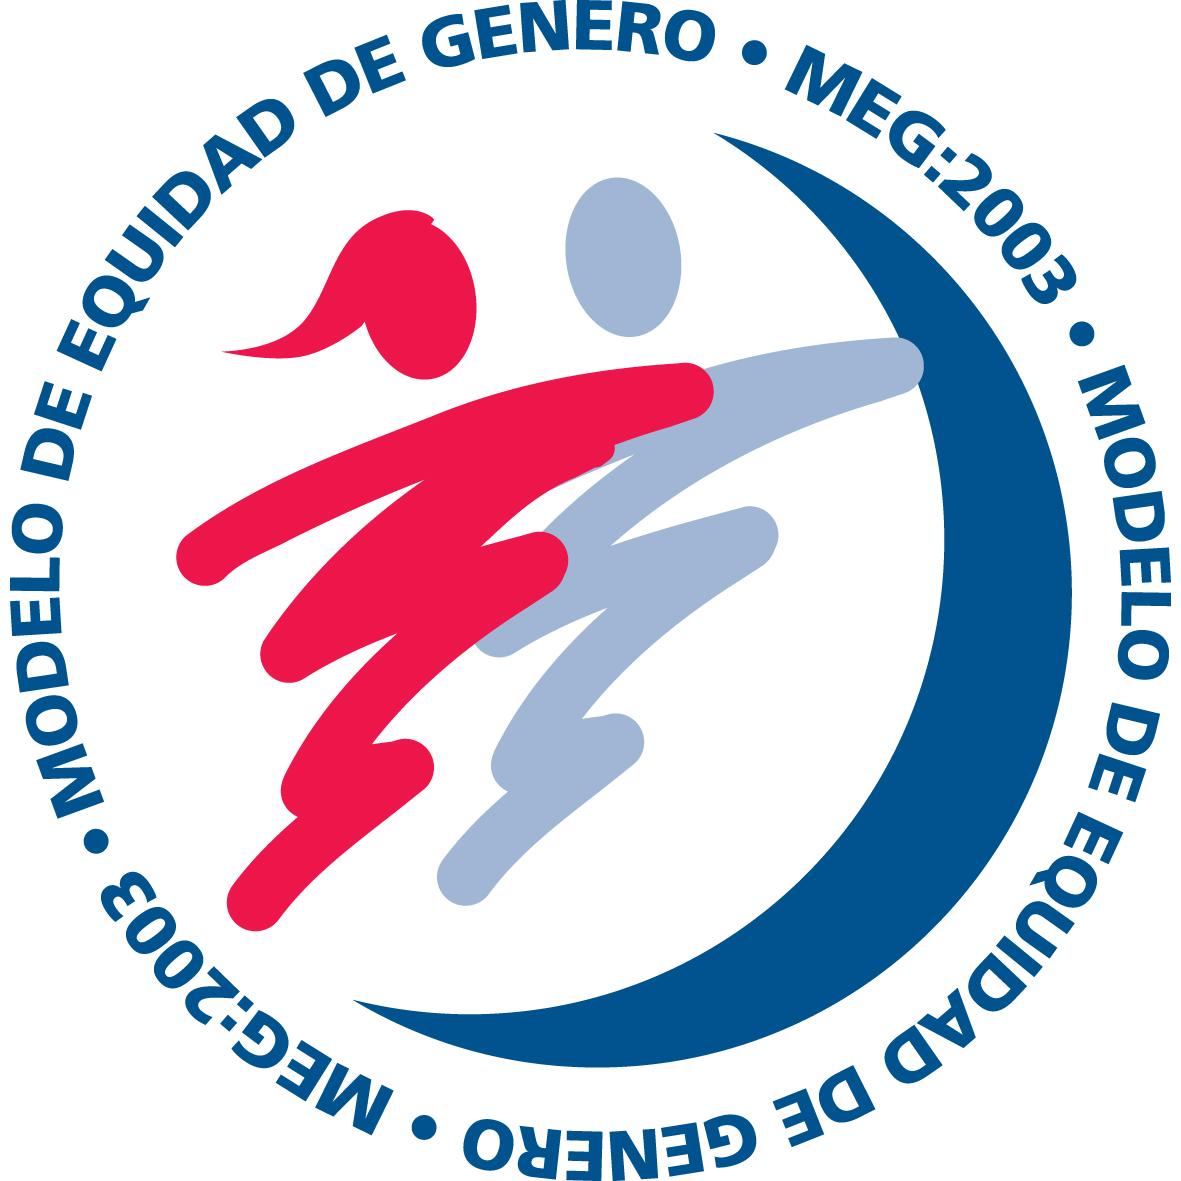 Logo modelo de equidad de género